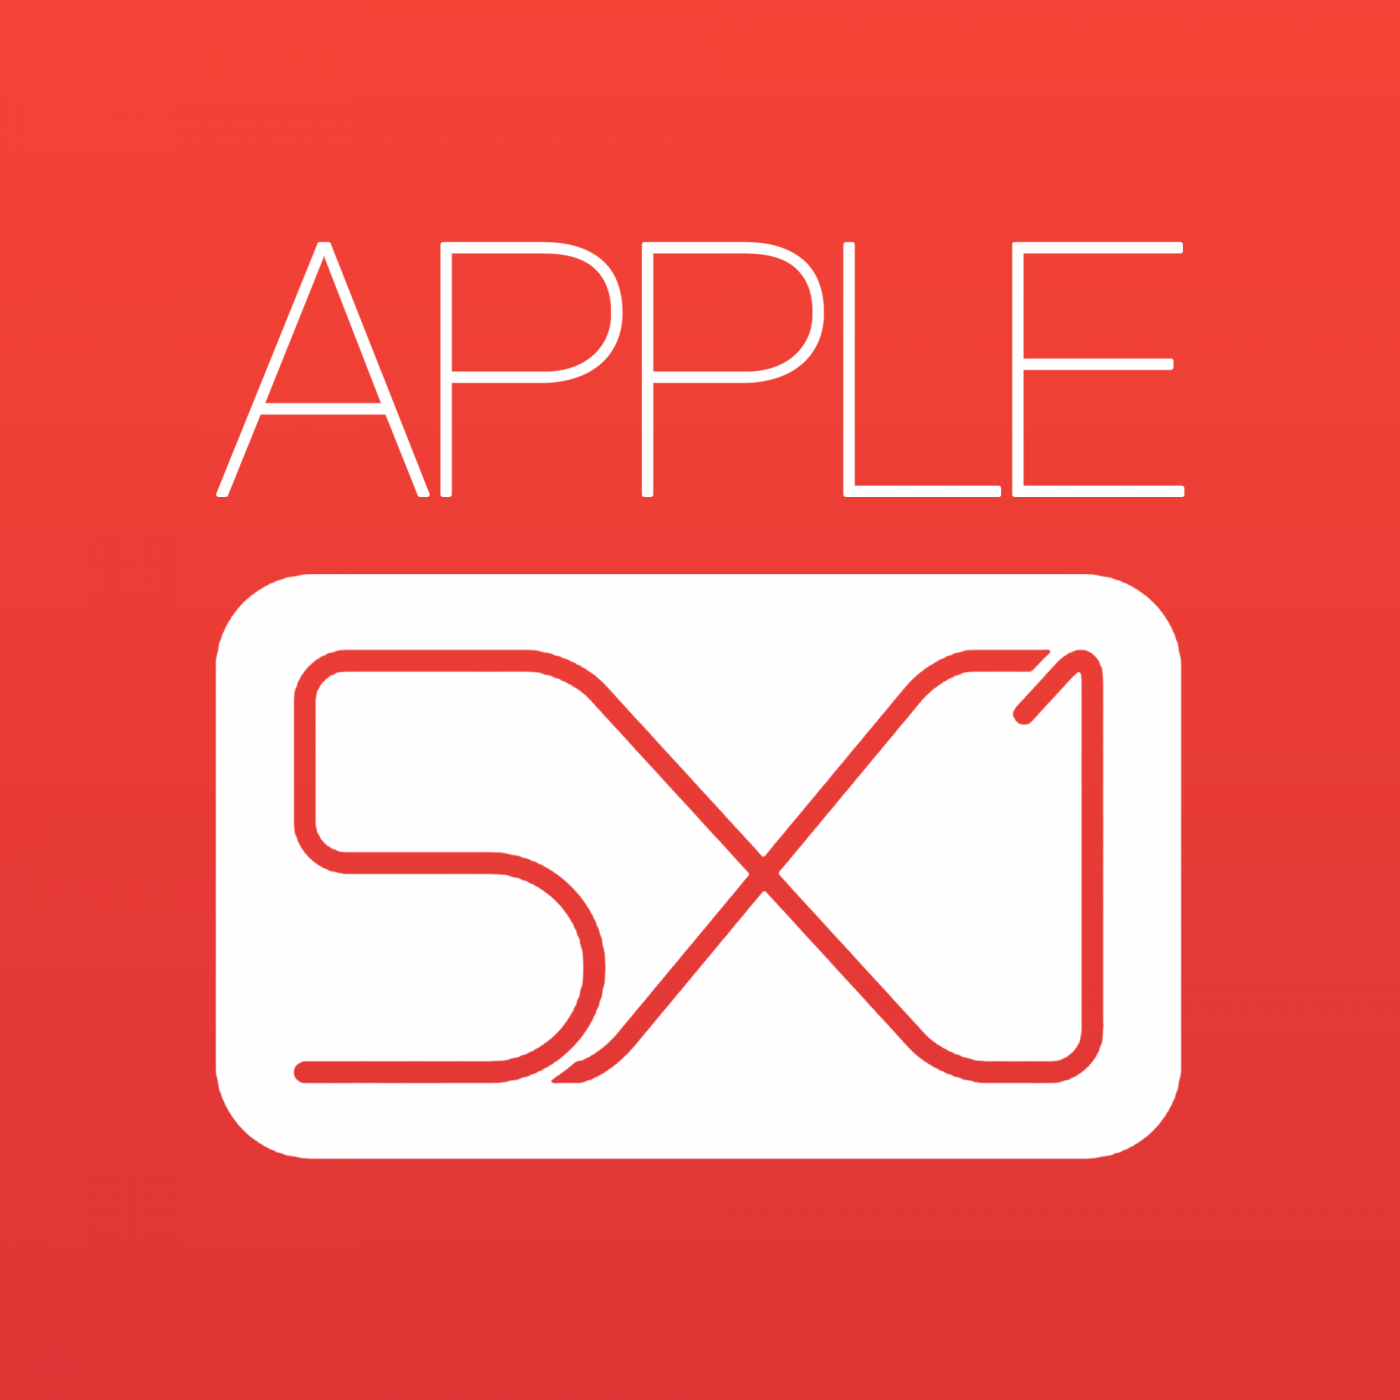 <![CDATA[Apple 5x1]]>